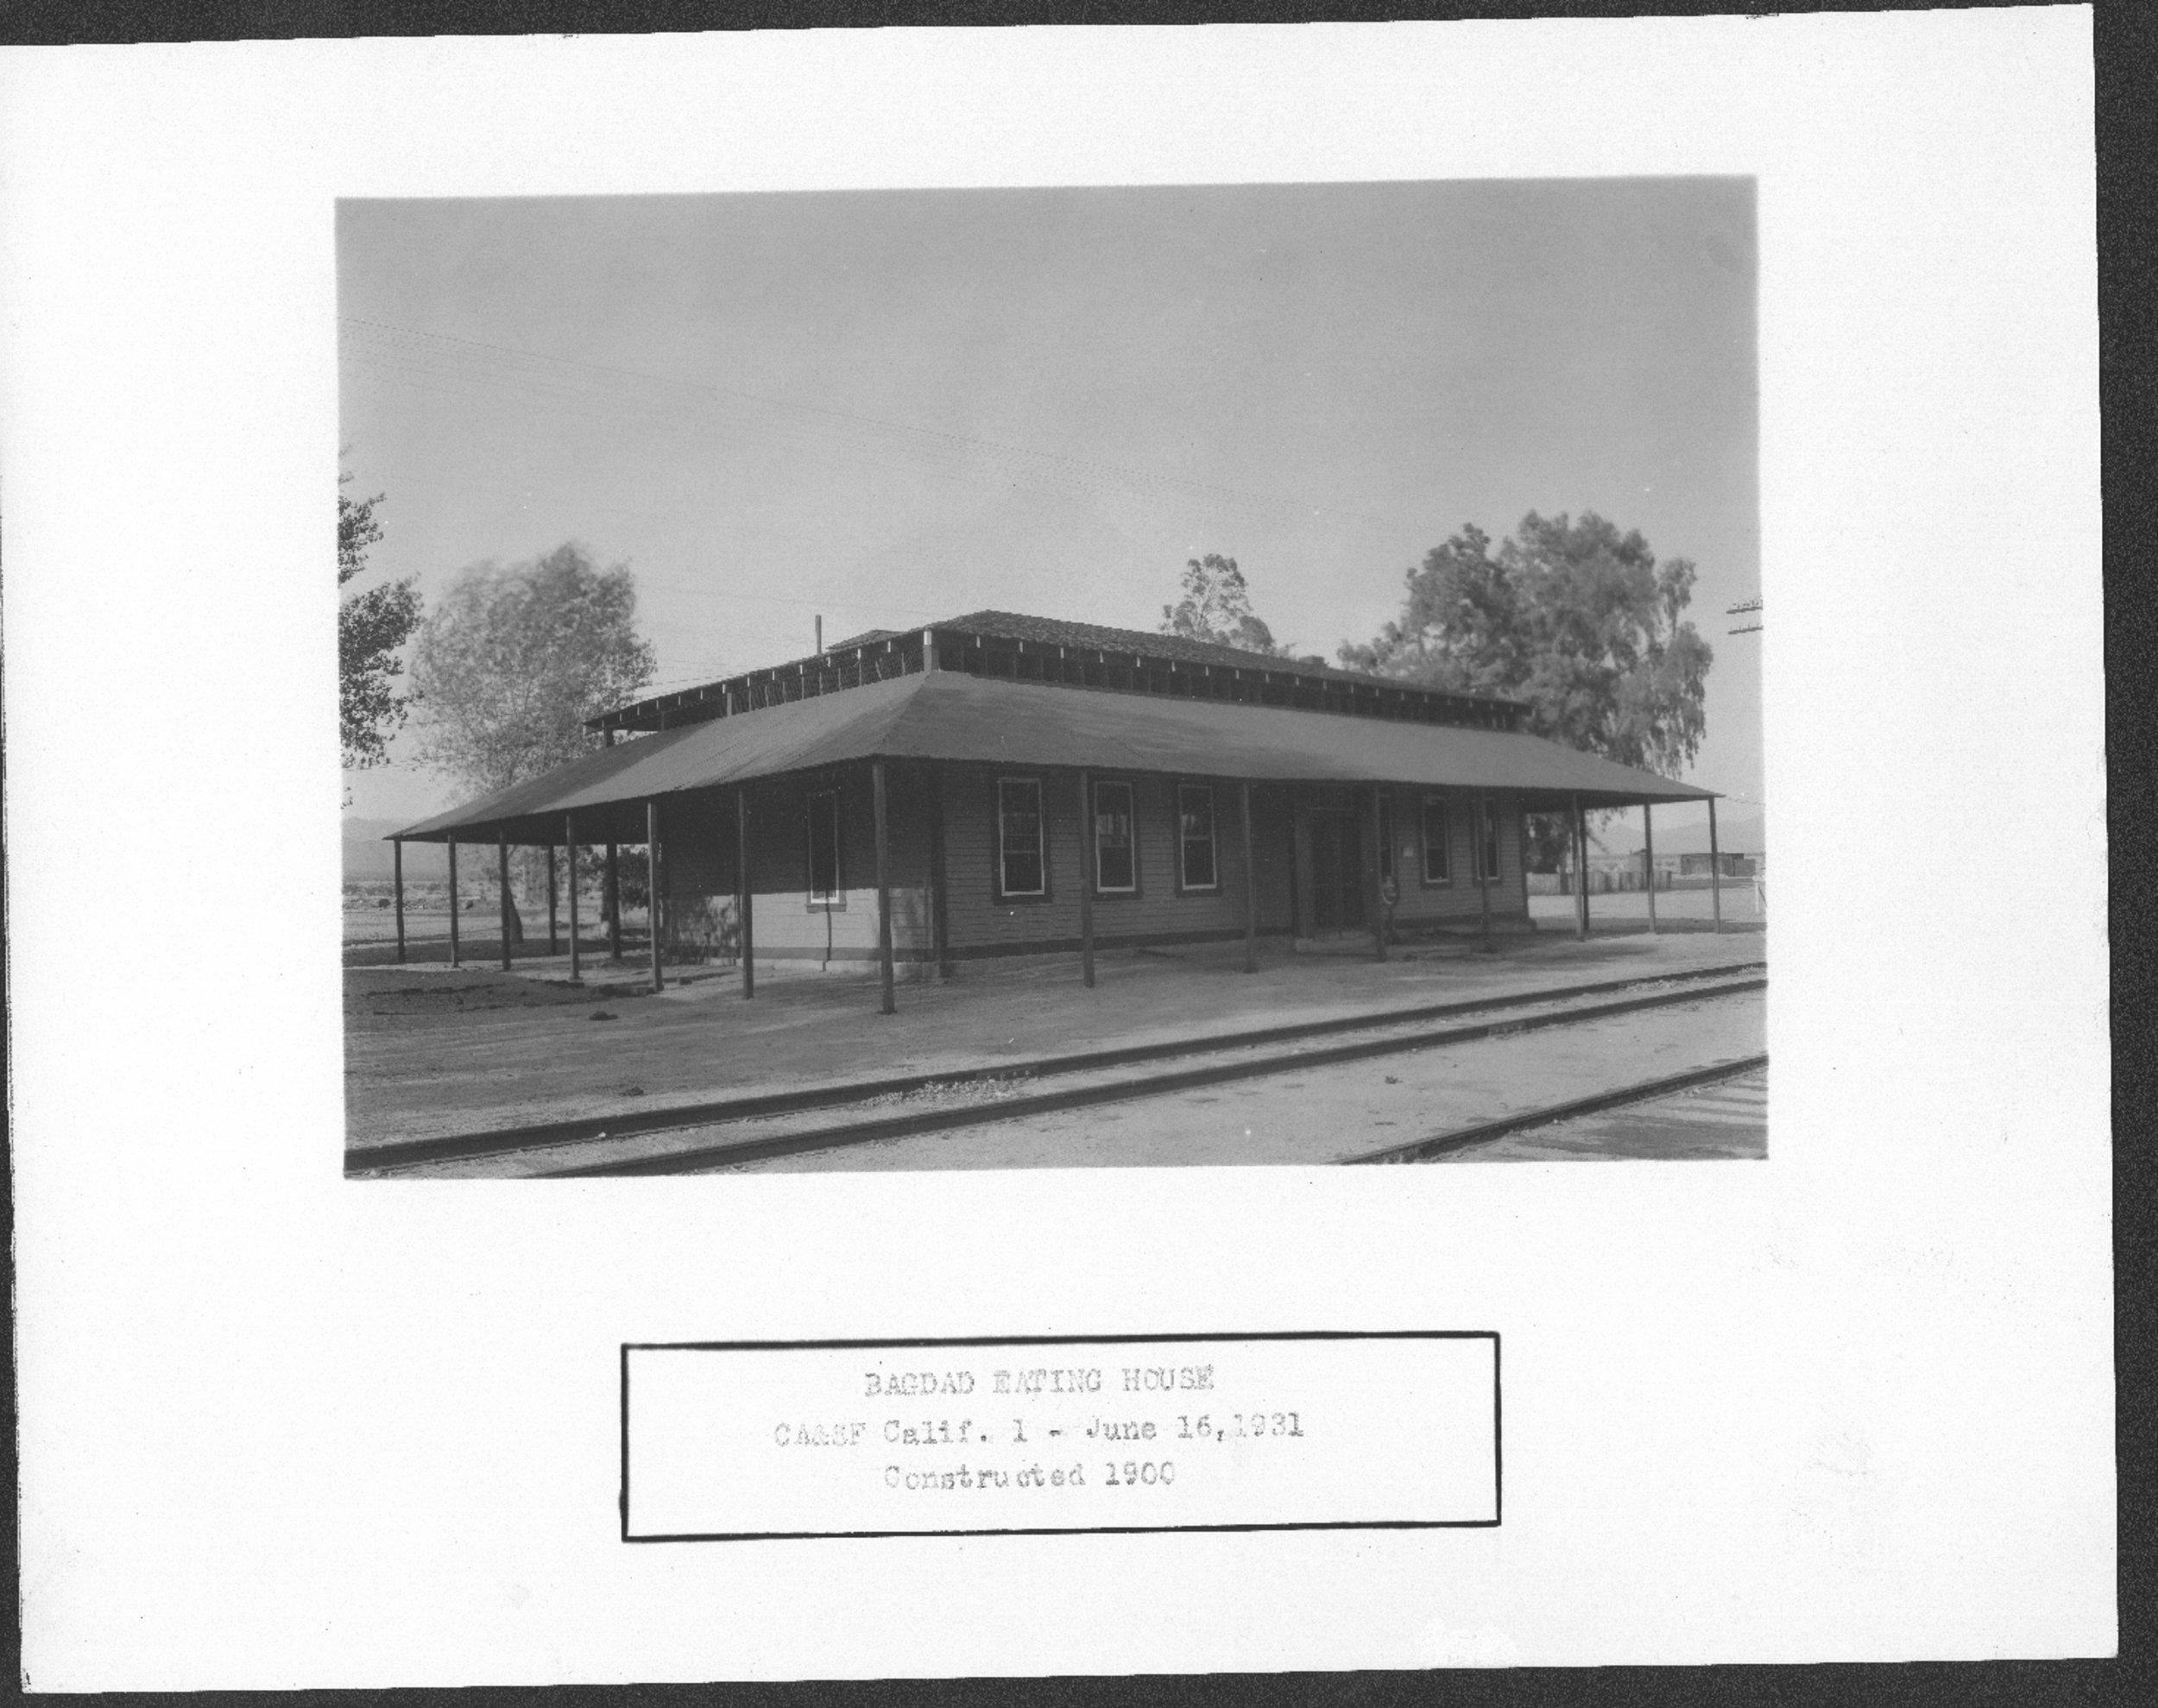 Atchison, Topeka and Santa Fe Railway Company depot and Fred Harvey House, Bagdad, California.